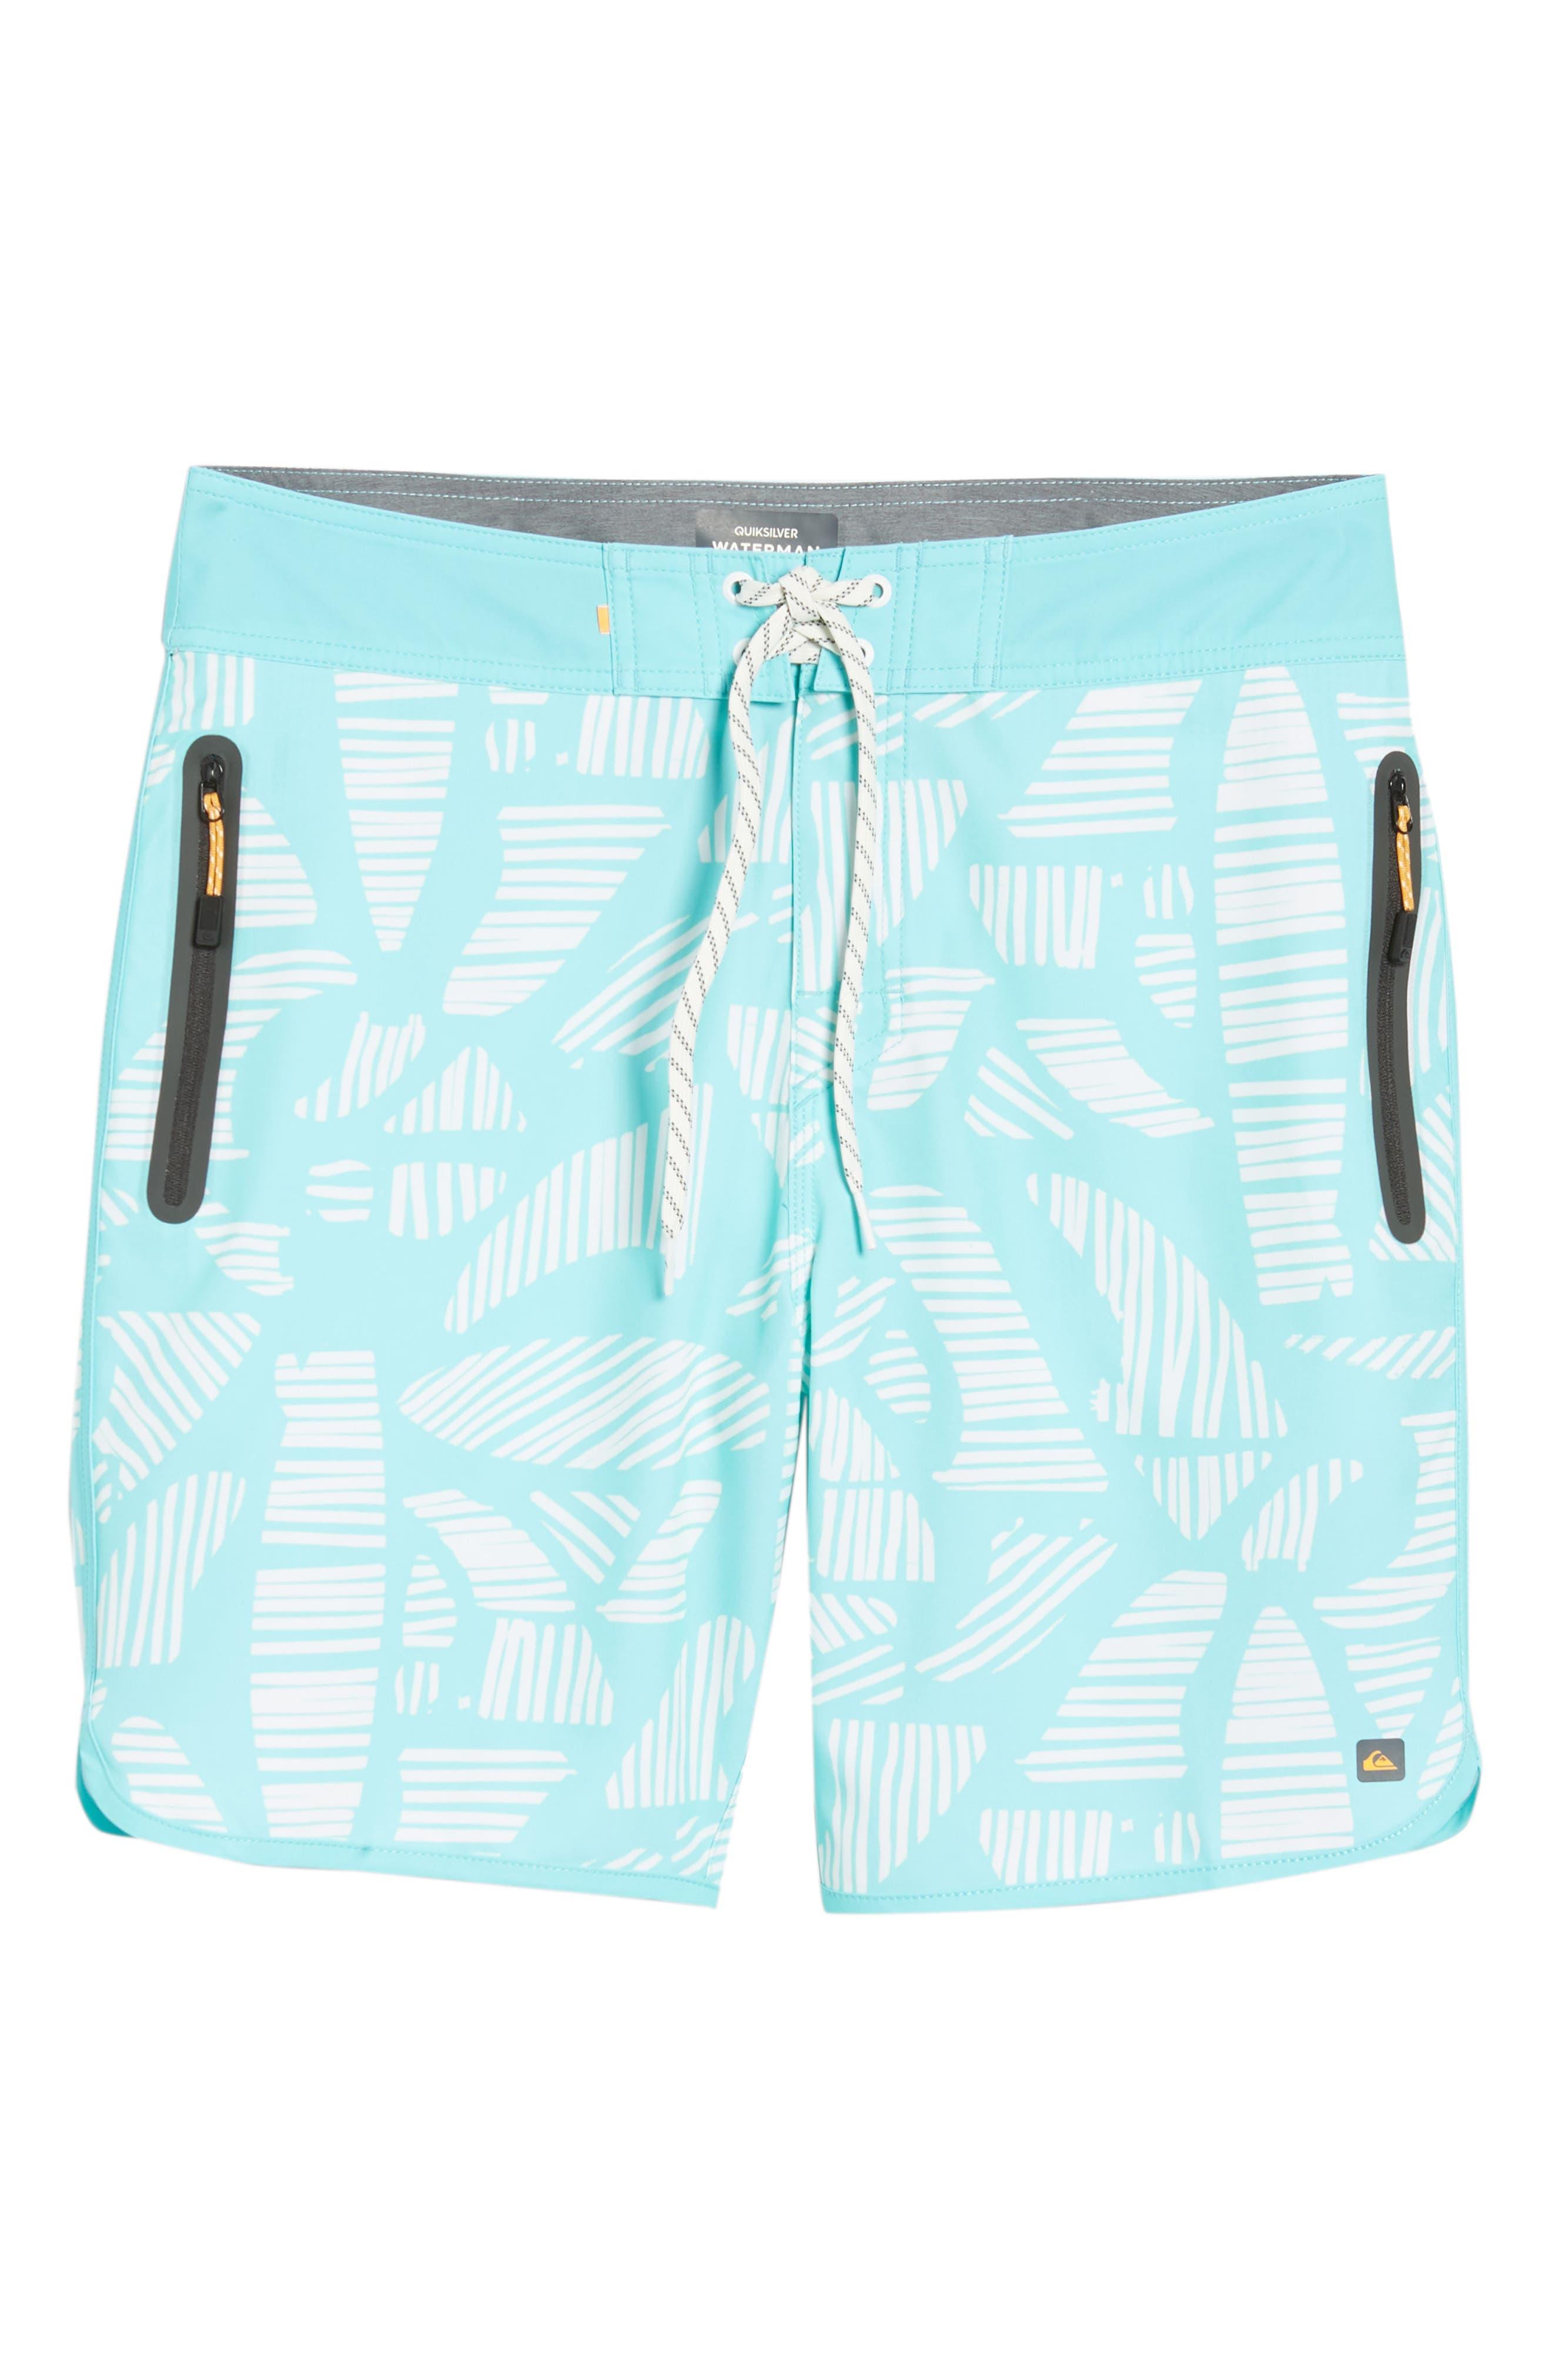 Odysea Board Shorts,                             Alternate thumbnail 6, color,                             BLUE RADIANCE